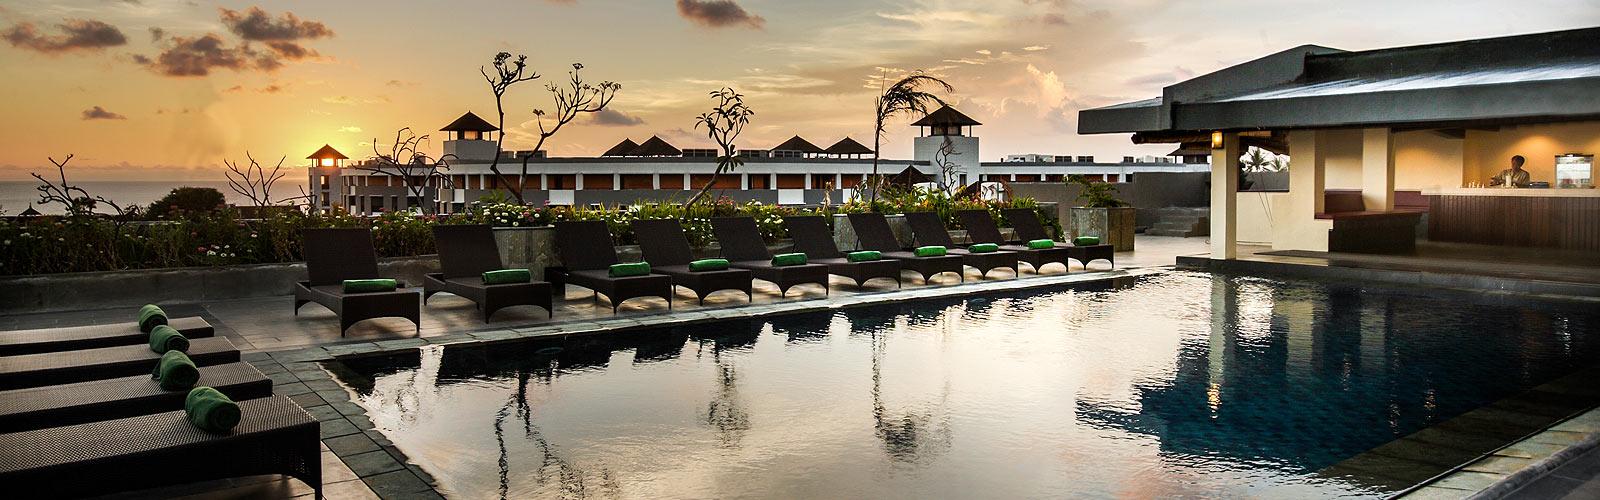 Lowongan Di Champlung Mas Hotel And Spa Kampus